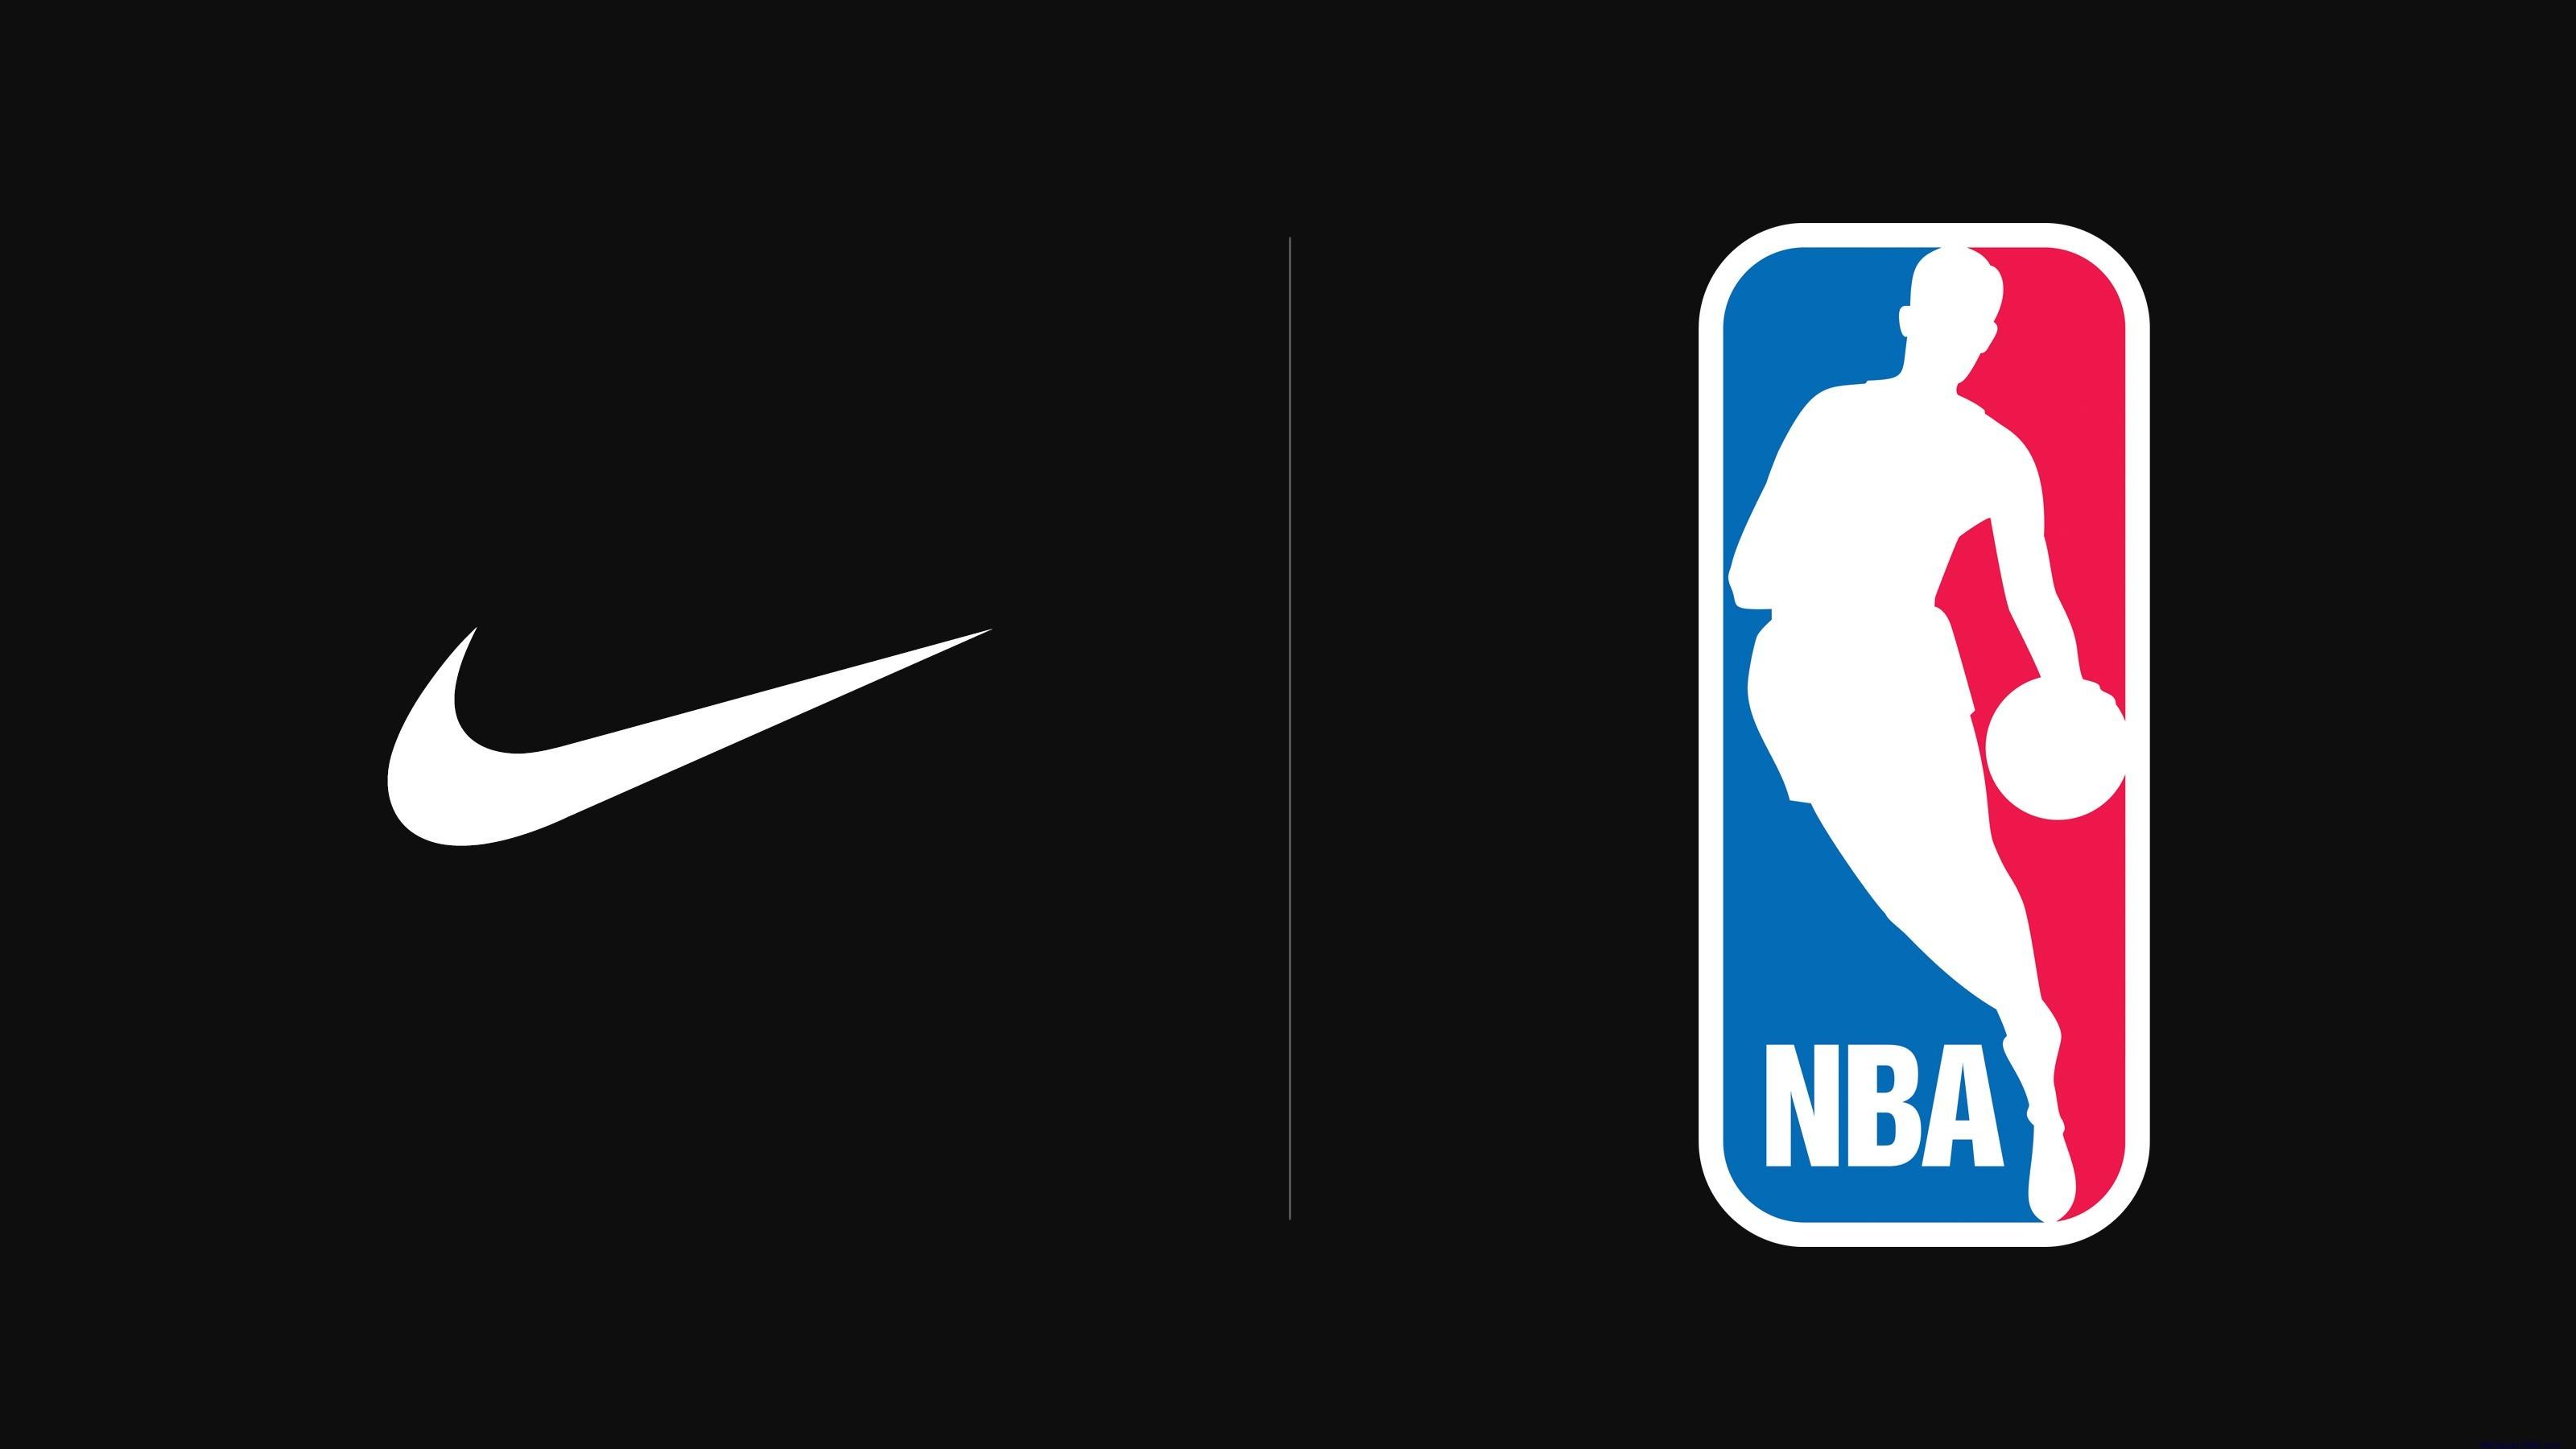 nike logo wallpaper hd 2017 rh wallpapertag com Nike Logo Design Nike Logo Design